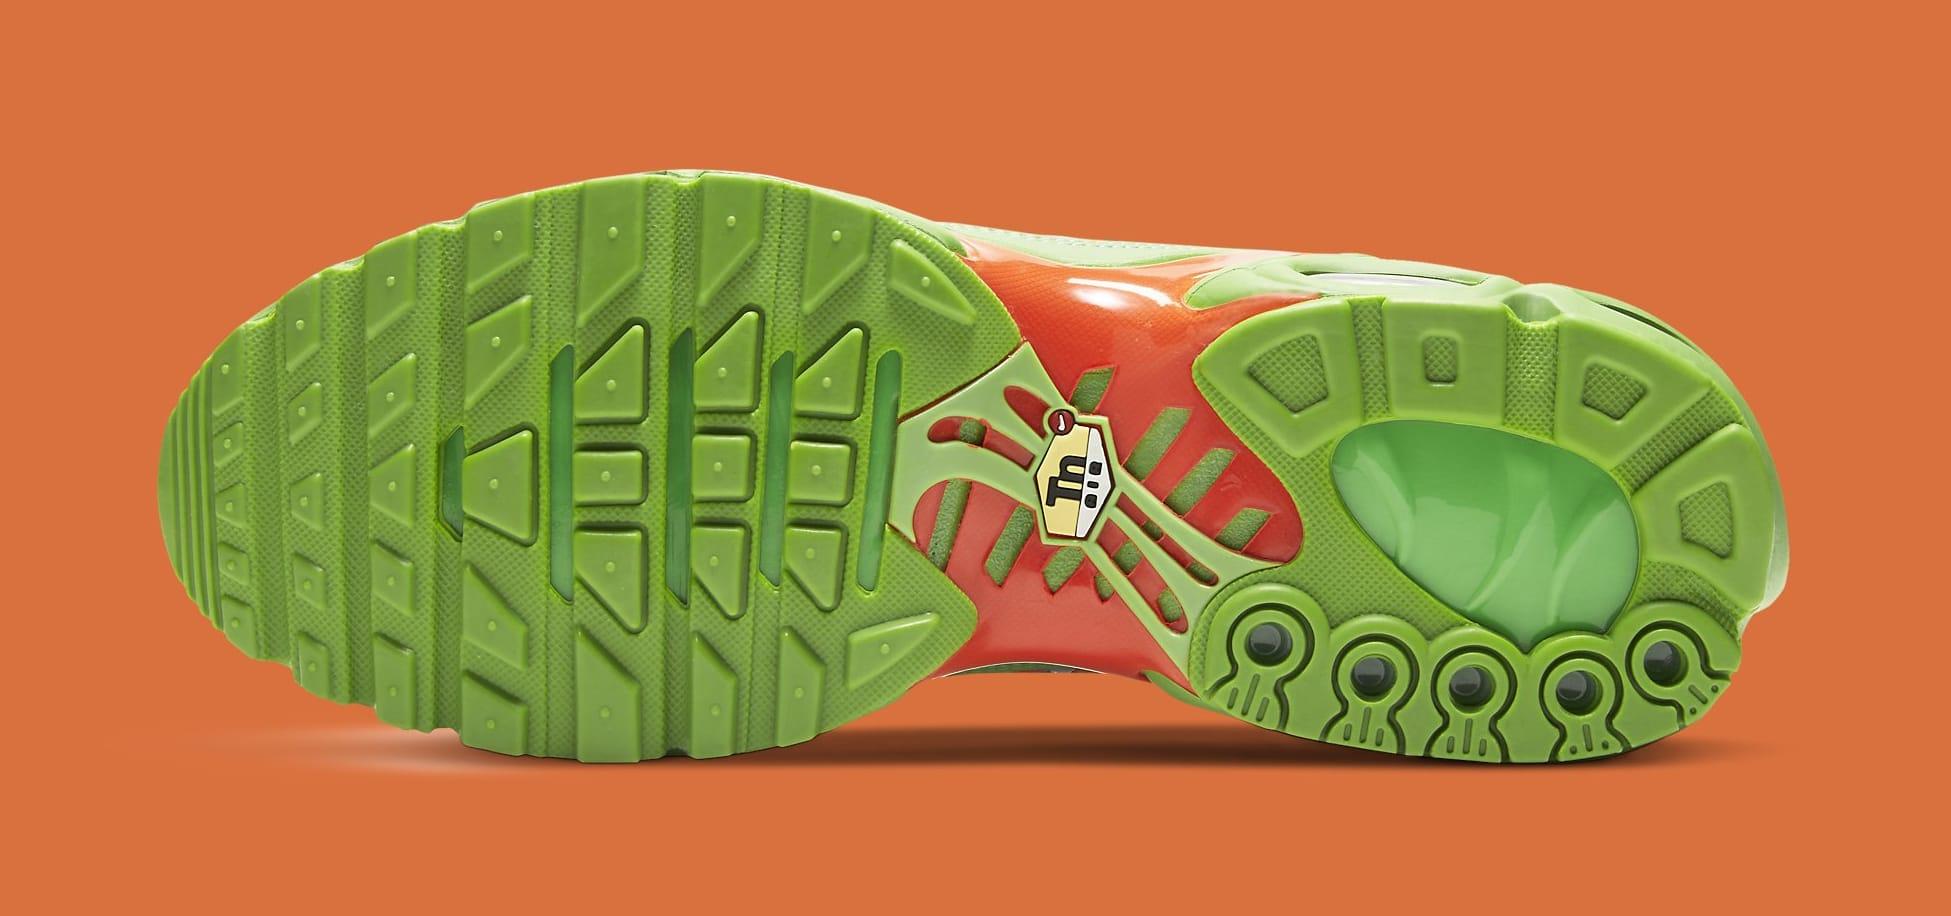 Supreme x Nike Air Max Plus 'Mean Green' DA1472-300 Outsole